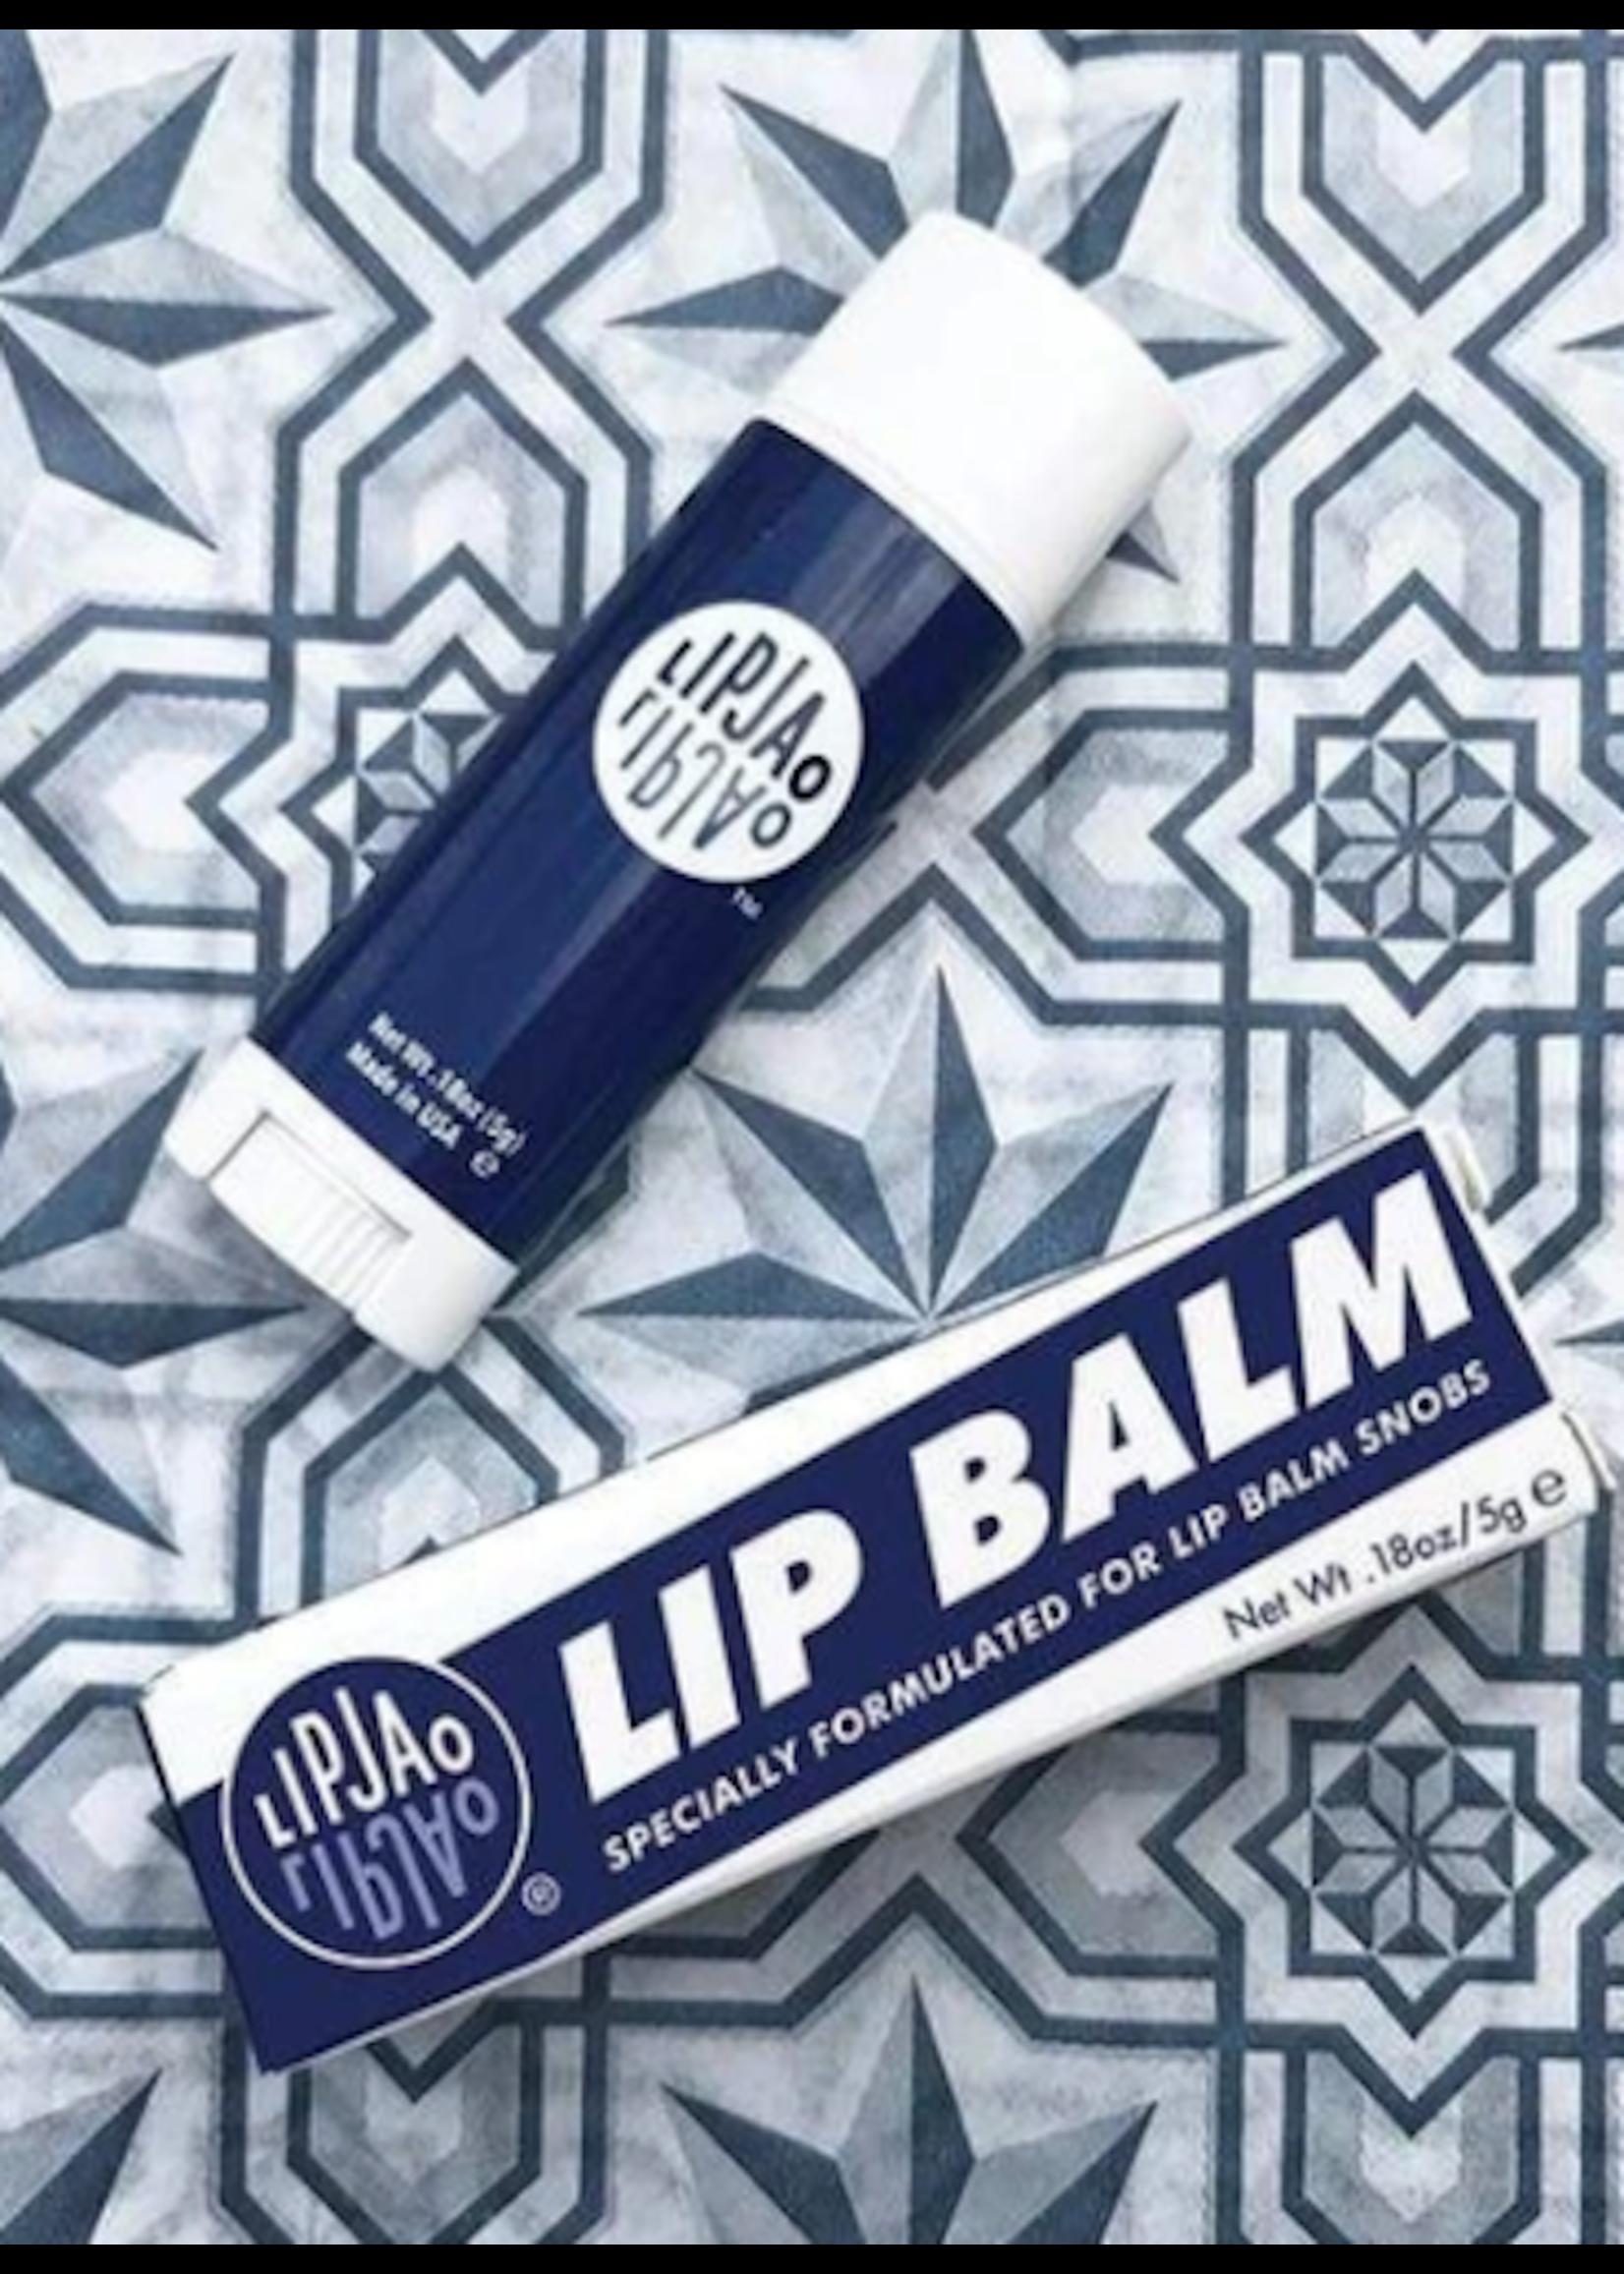 Jao Brand Lip Balm